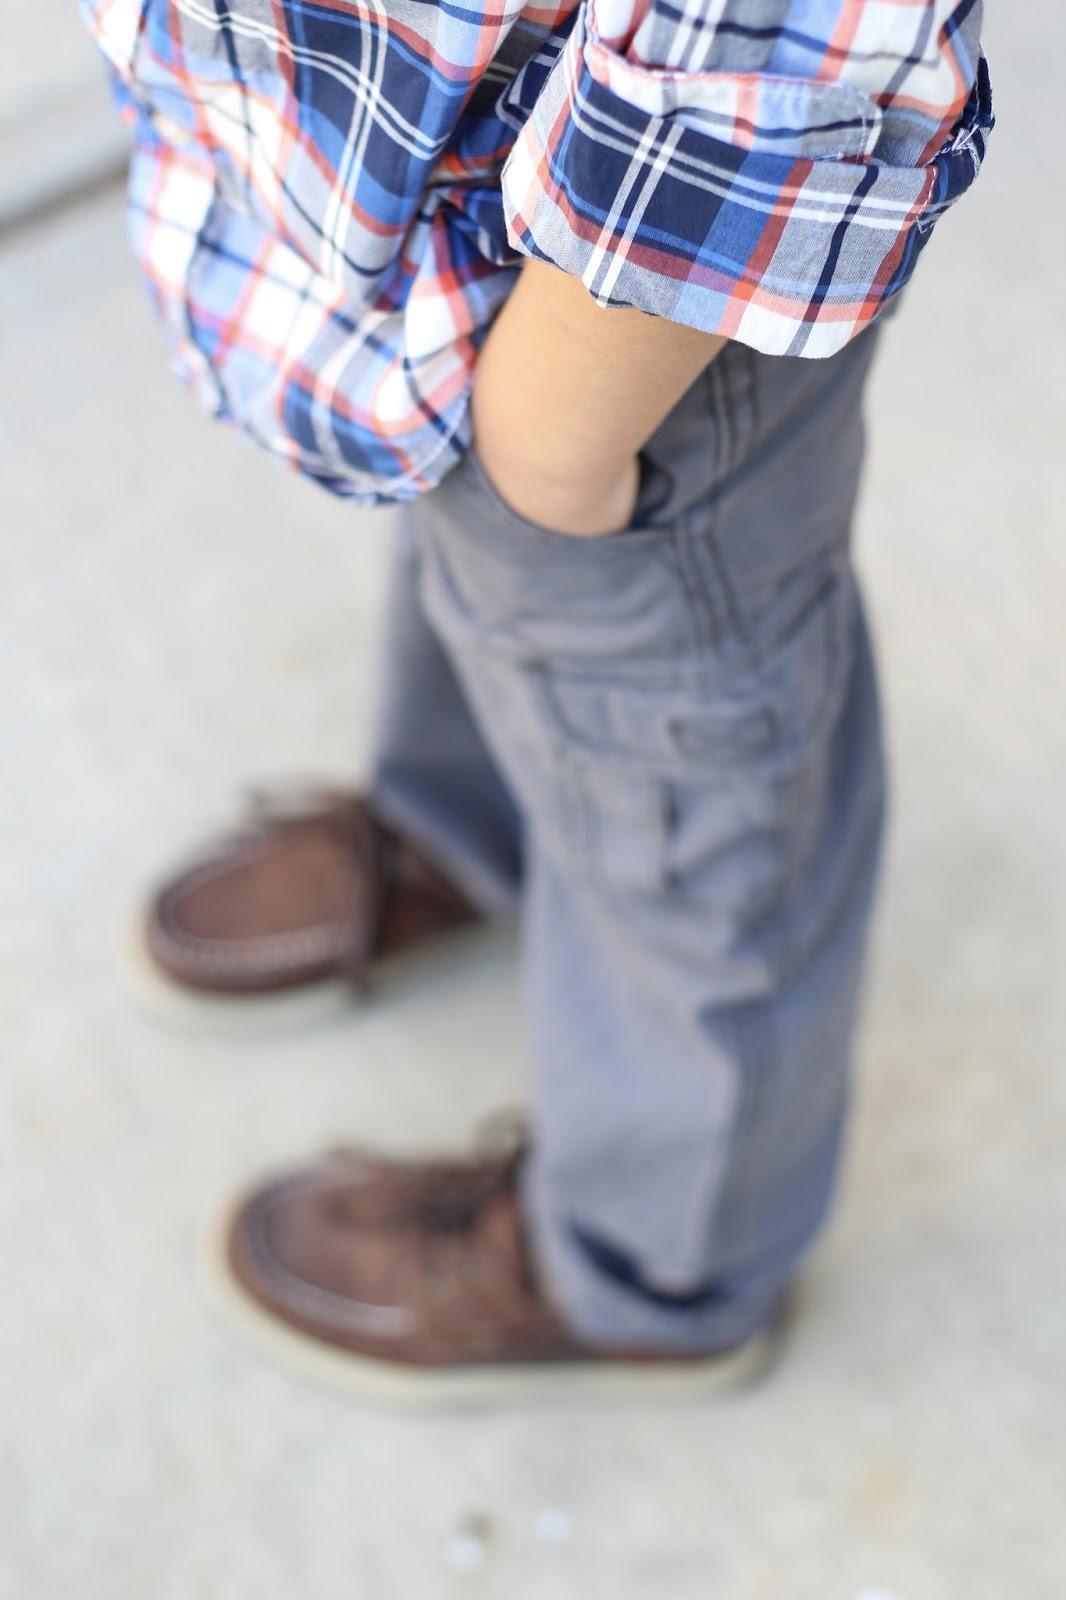 Kohl's Carters Back to School, preppy boy style